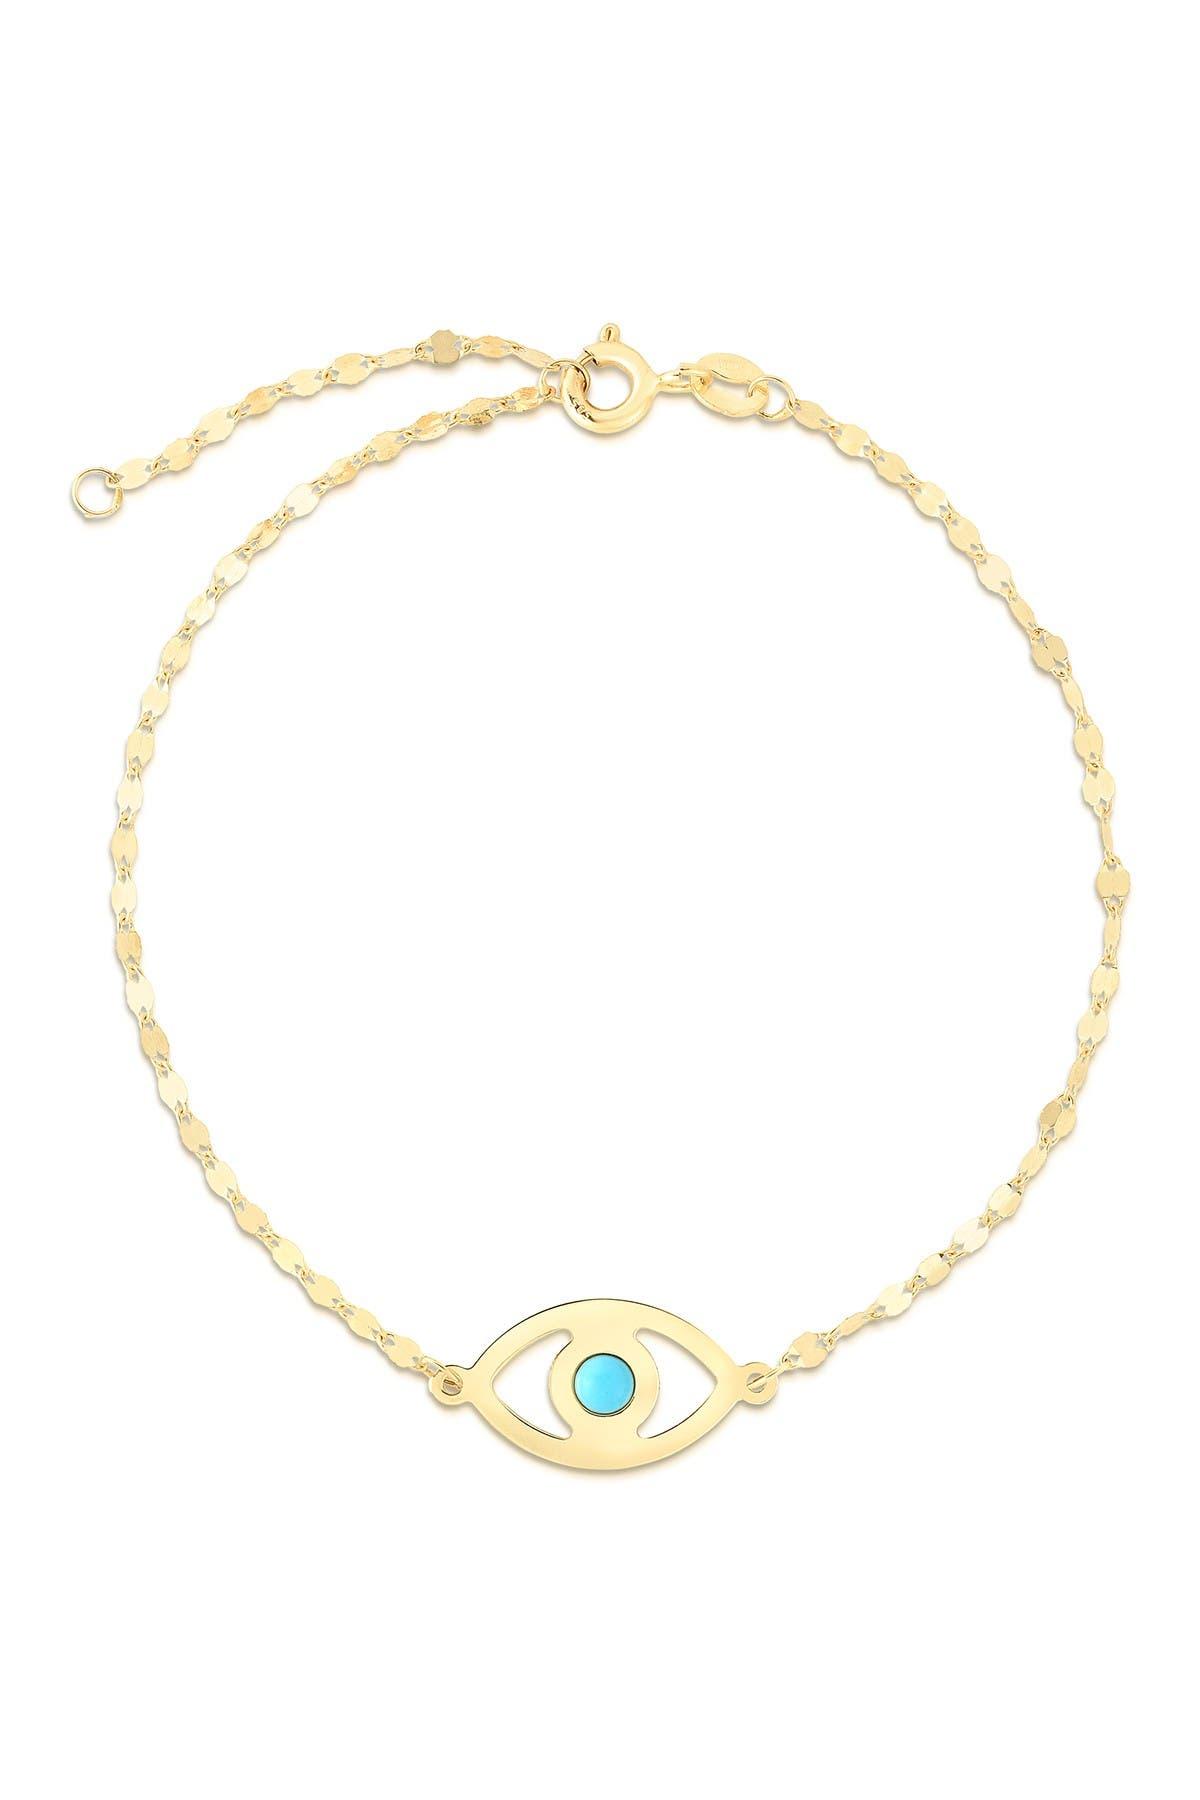 Image of Sphera Milano 14K Yellow Gold Plated Sterling Silver Evil Eye Bracelet